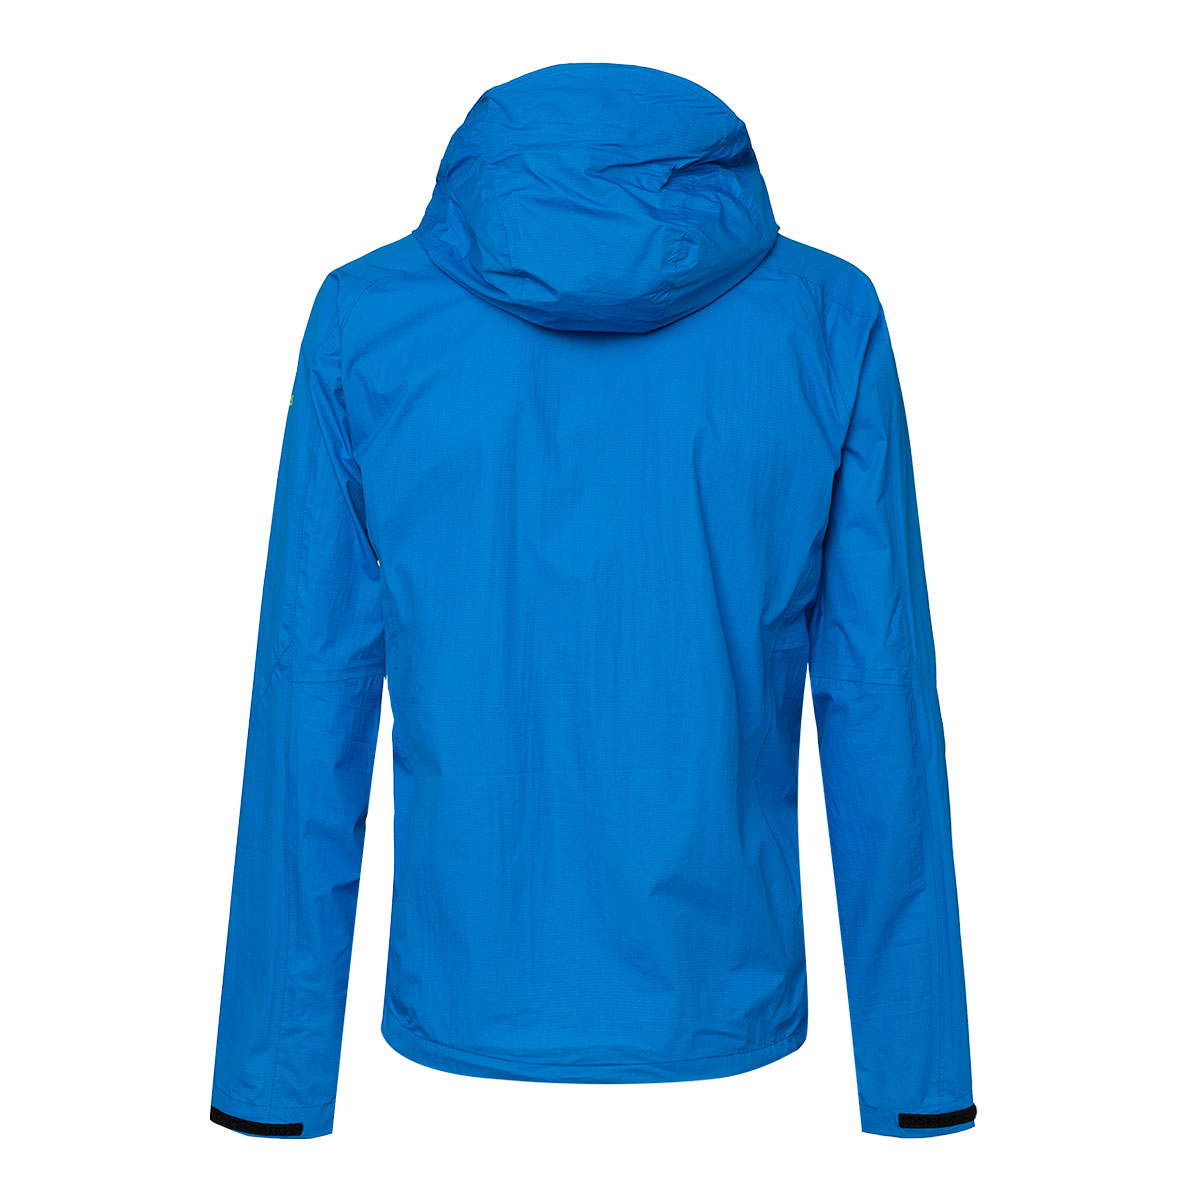 UNISEX'S SEIL RAIN JACKET BLUE